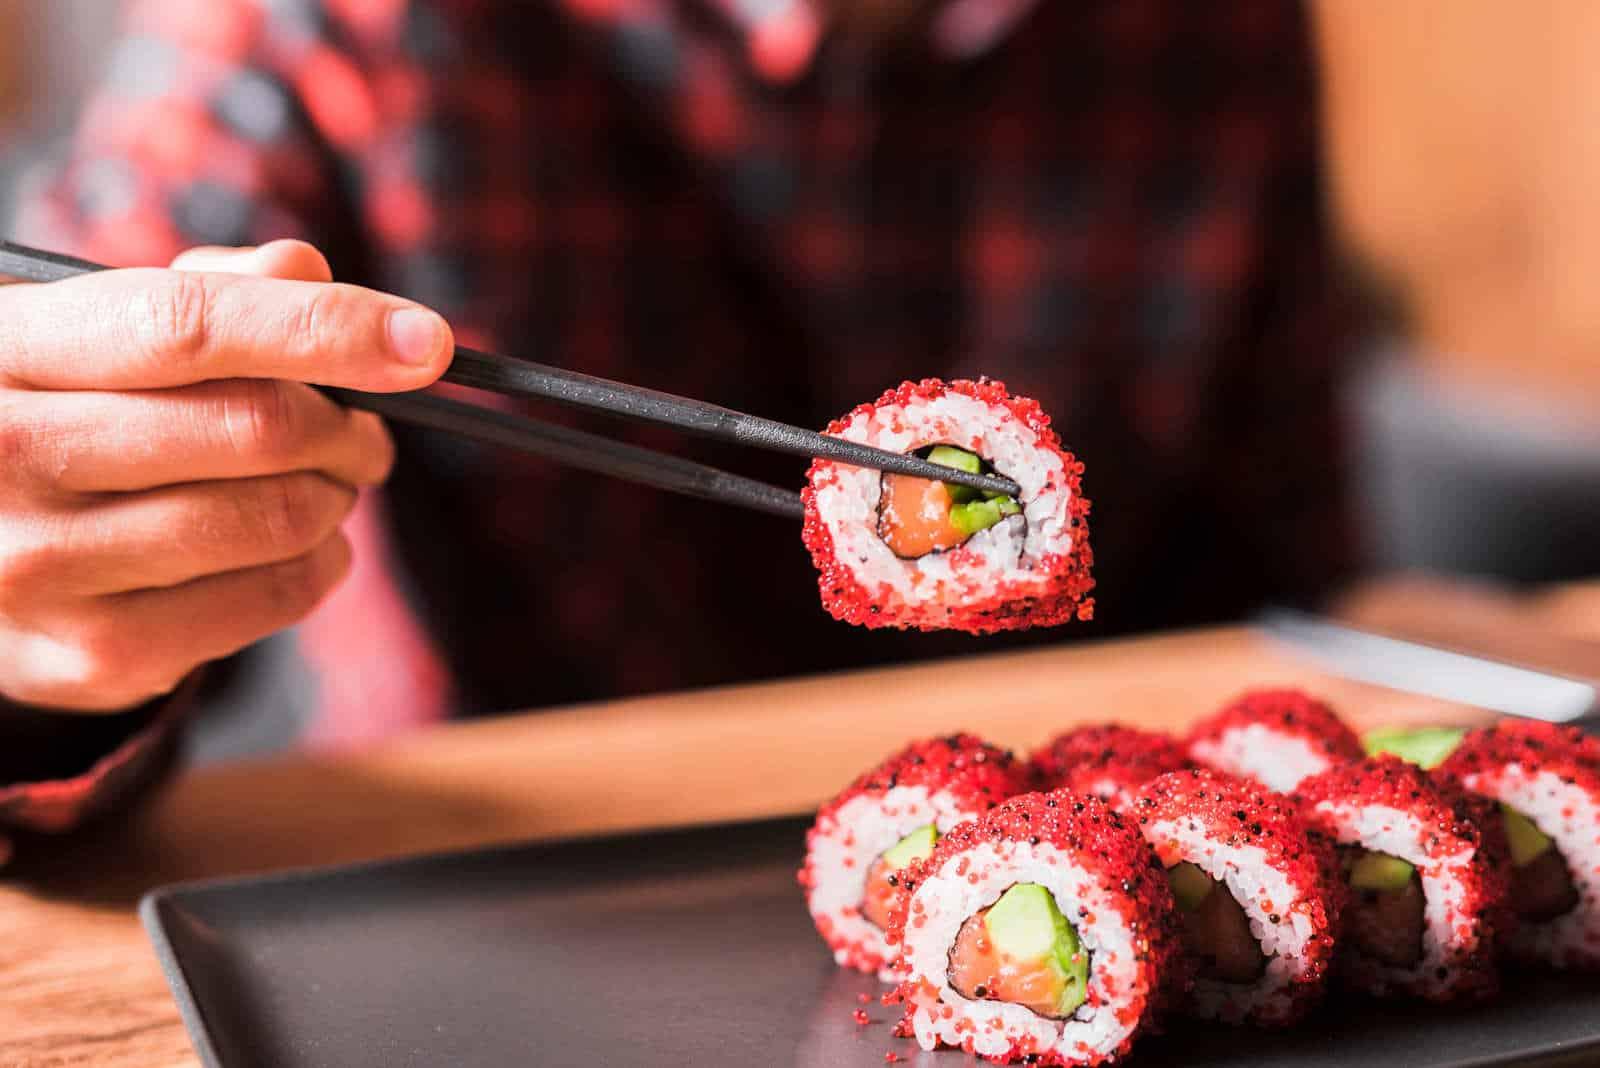 Oishi Sushi Restaurant & Bar of Shawnee